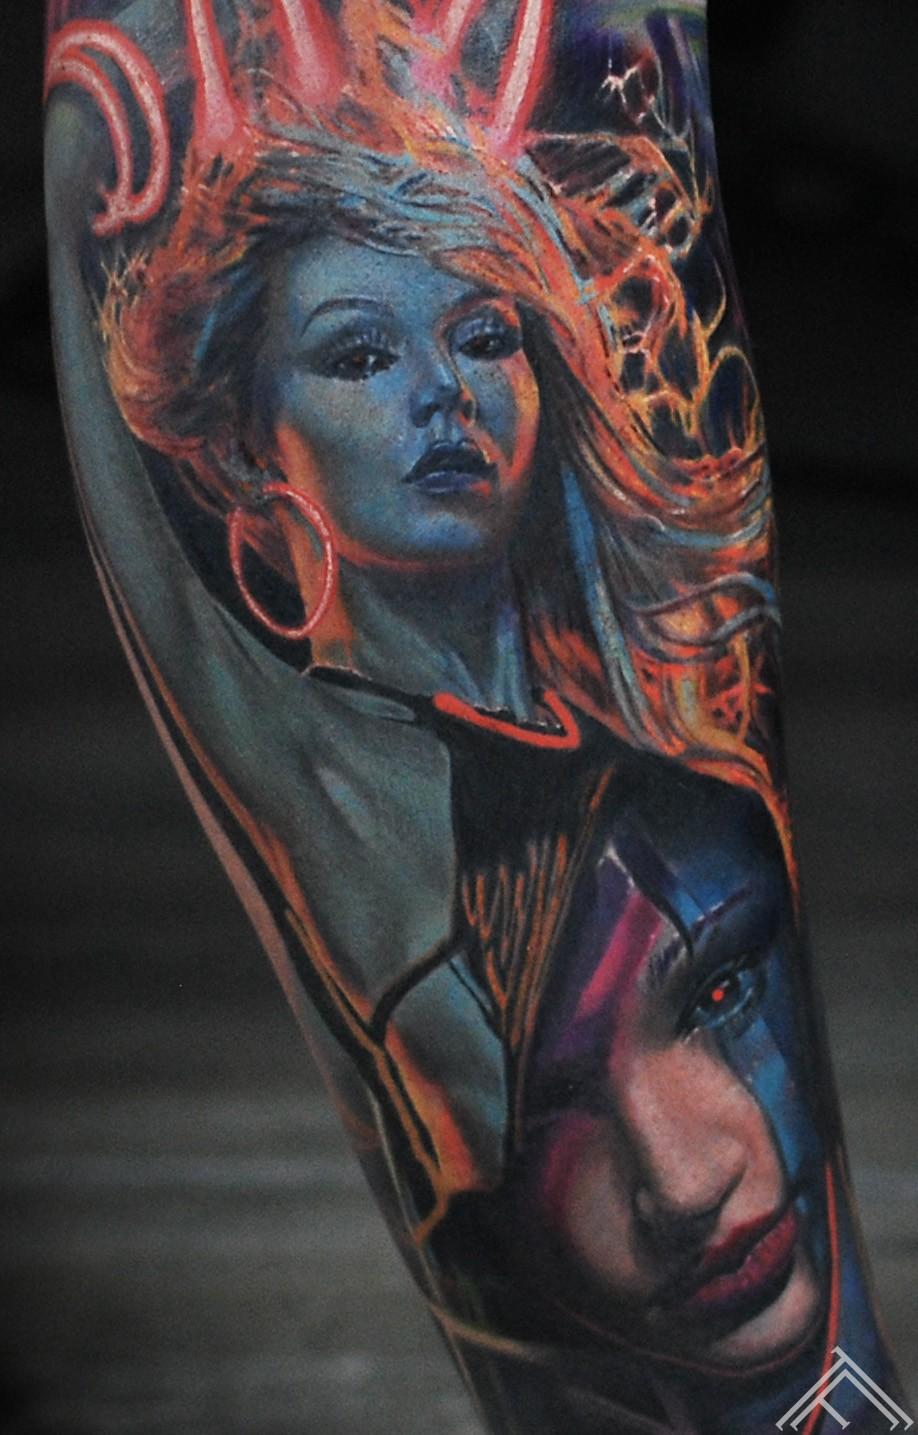 girl-sexy-rabit-playboy-art-fashion-acid-model-portrait-lightning-space-bladerunner-tattoofrequency-riga-art-latvija-europe-tetovejums-marispavlo